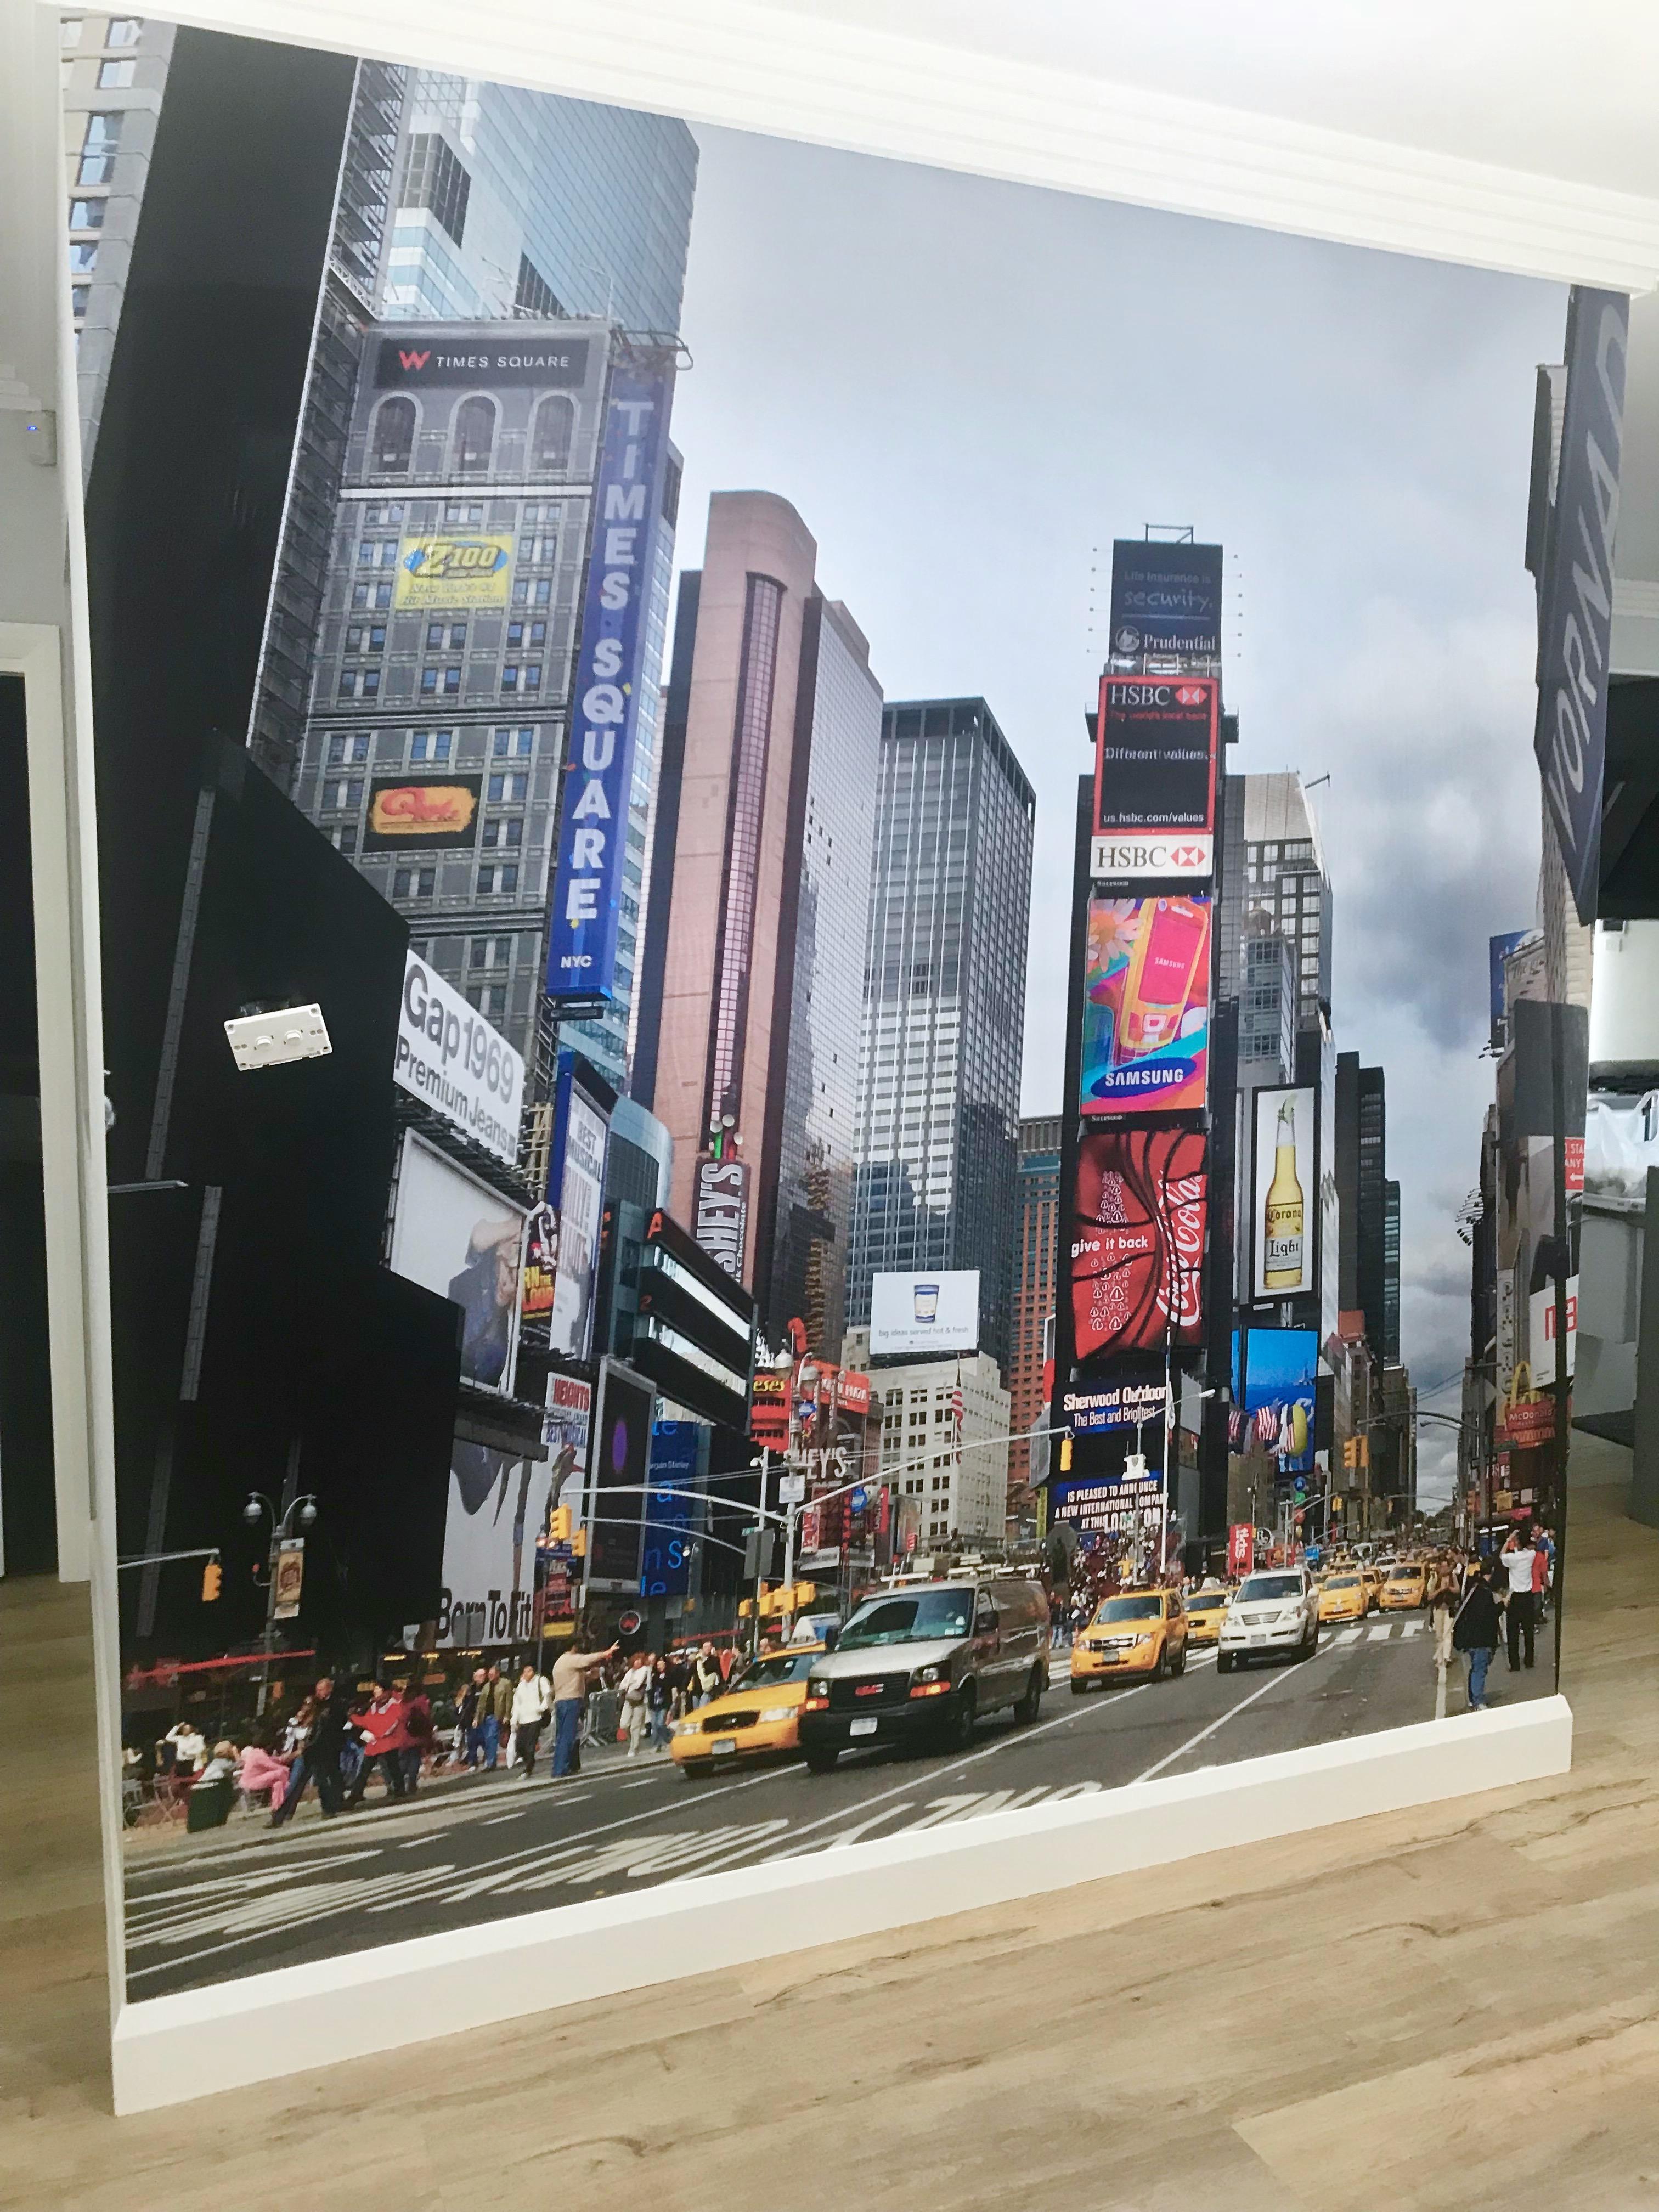 Wallpaper murals for homesick expats